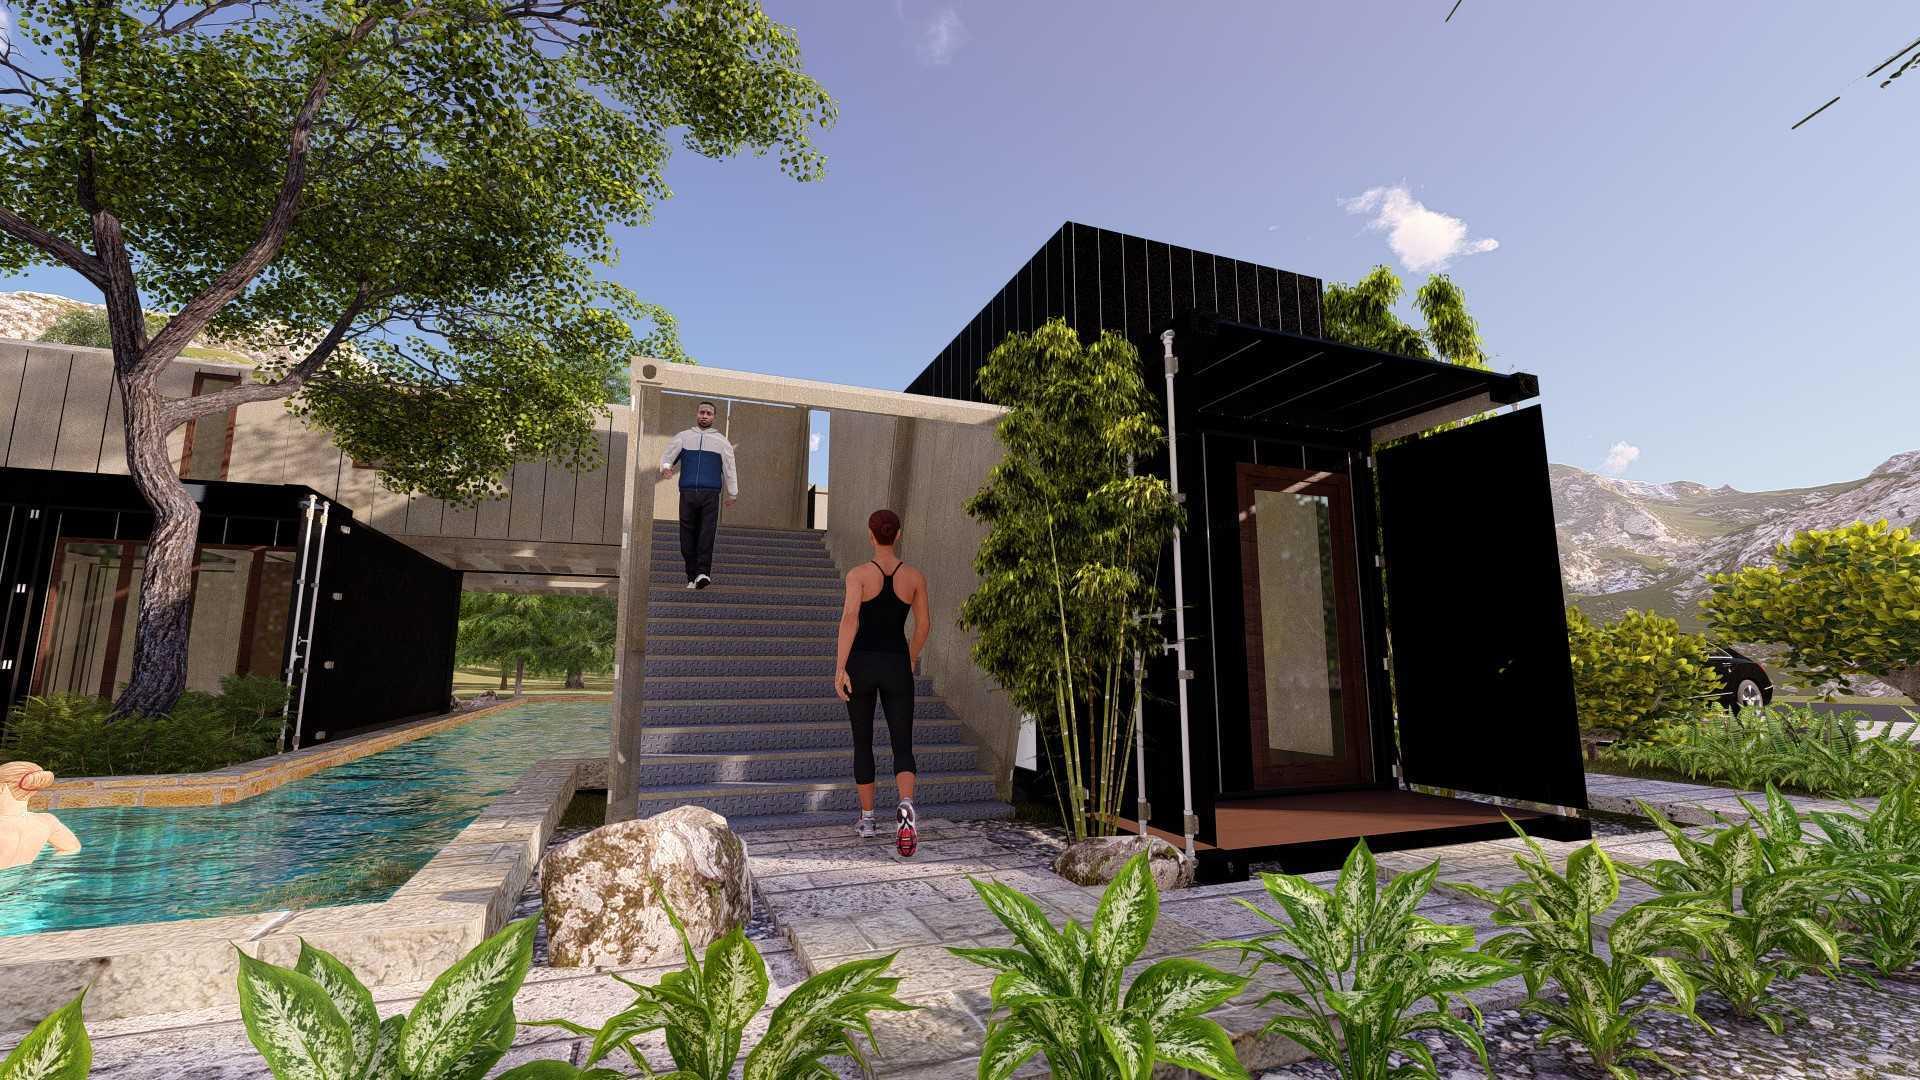 Rasi.o Arsitektur Studio Box2Box Container Villa Indonesia Indonesia Rasio-Arsitektur-Studio-Box2Box-Container-Villa   127545